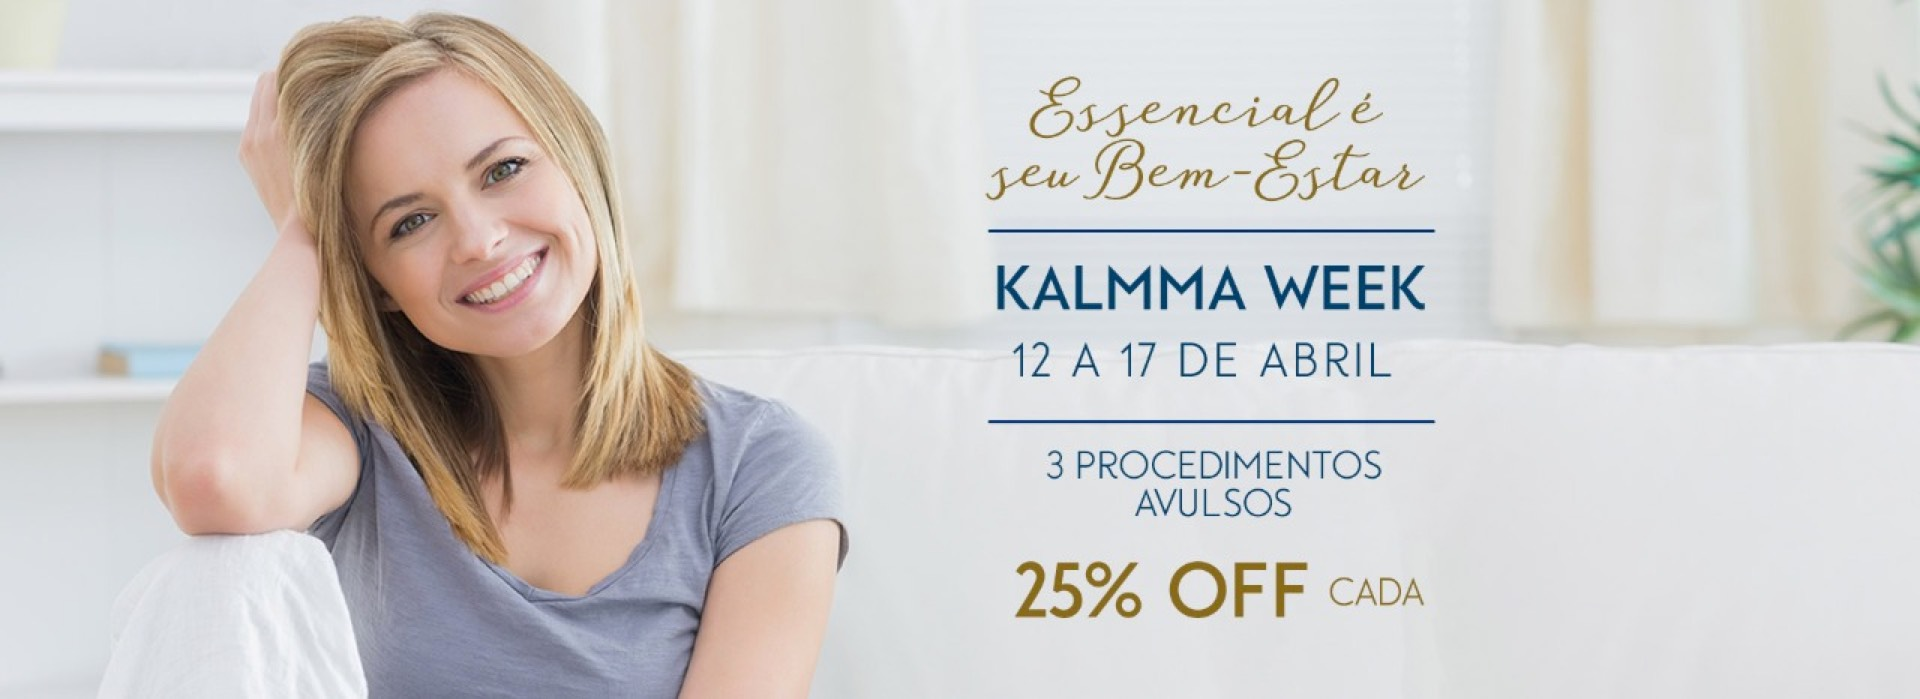 Kalmma Week 2021 9